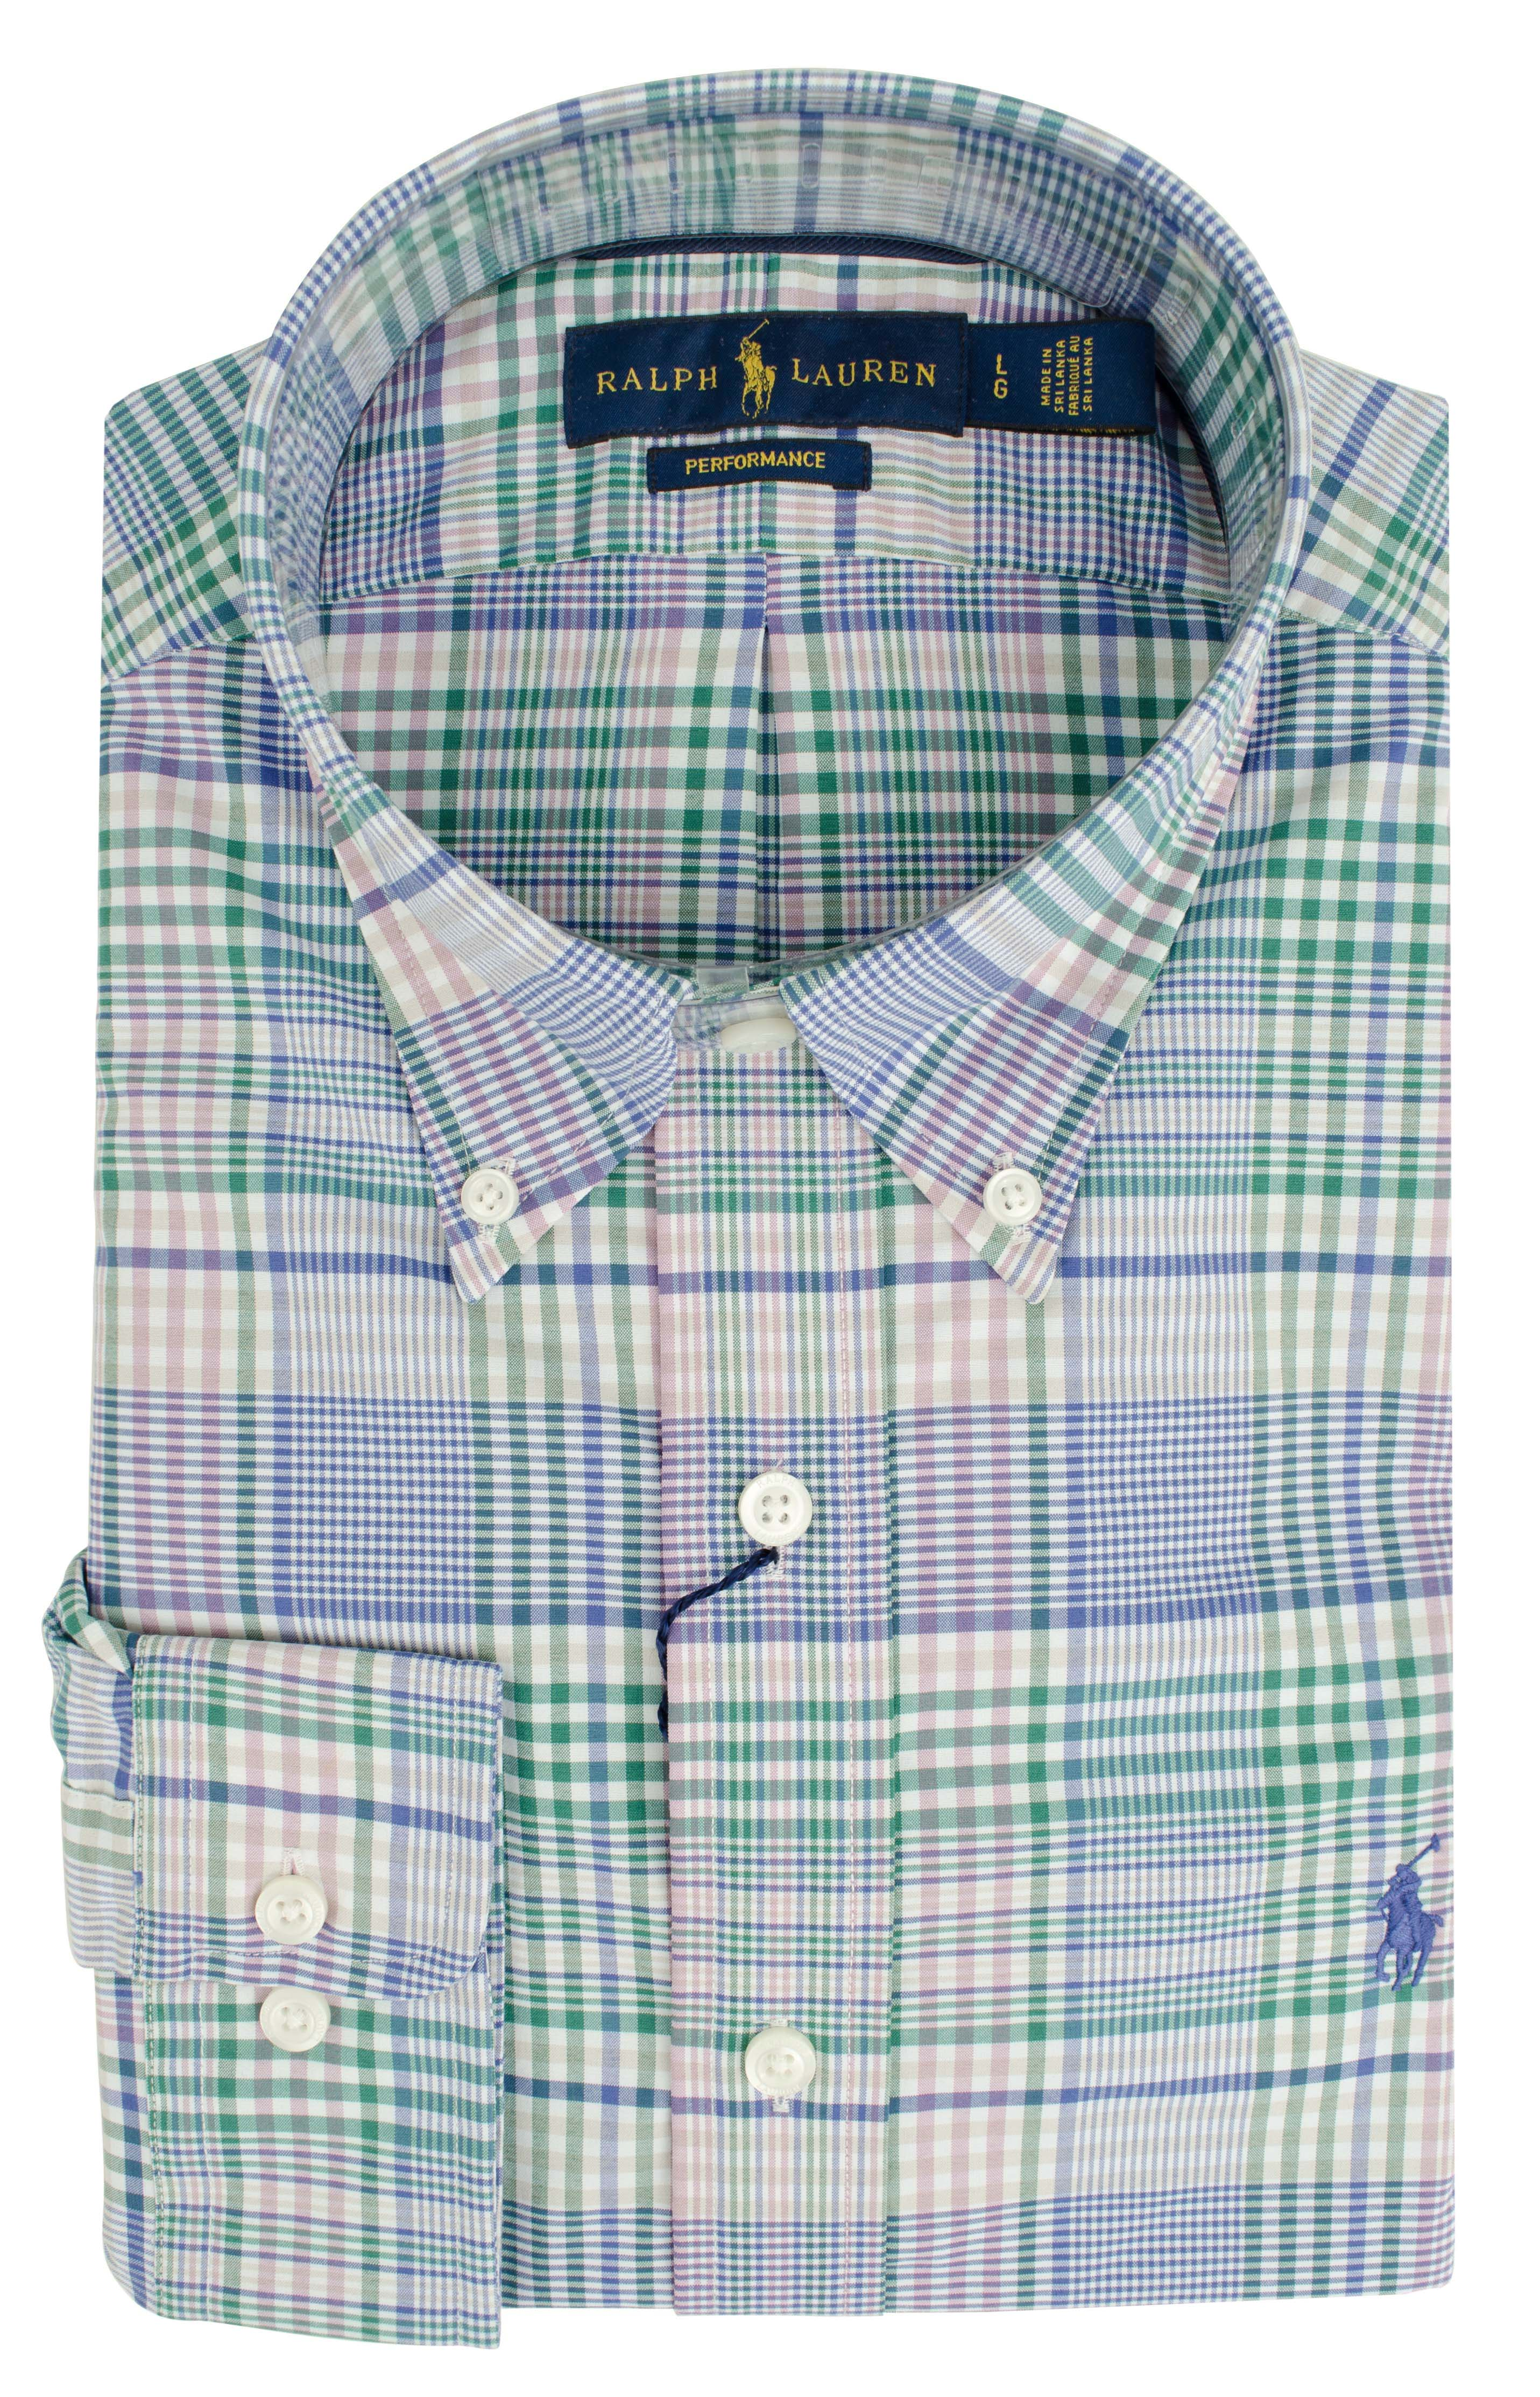 afebbaaf5 Polo Ralph Lauren Men s Classic Fit Performance Twill Long Sleeve Shirt-B-XL